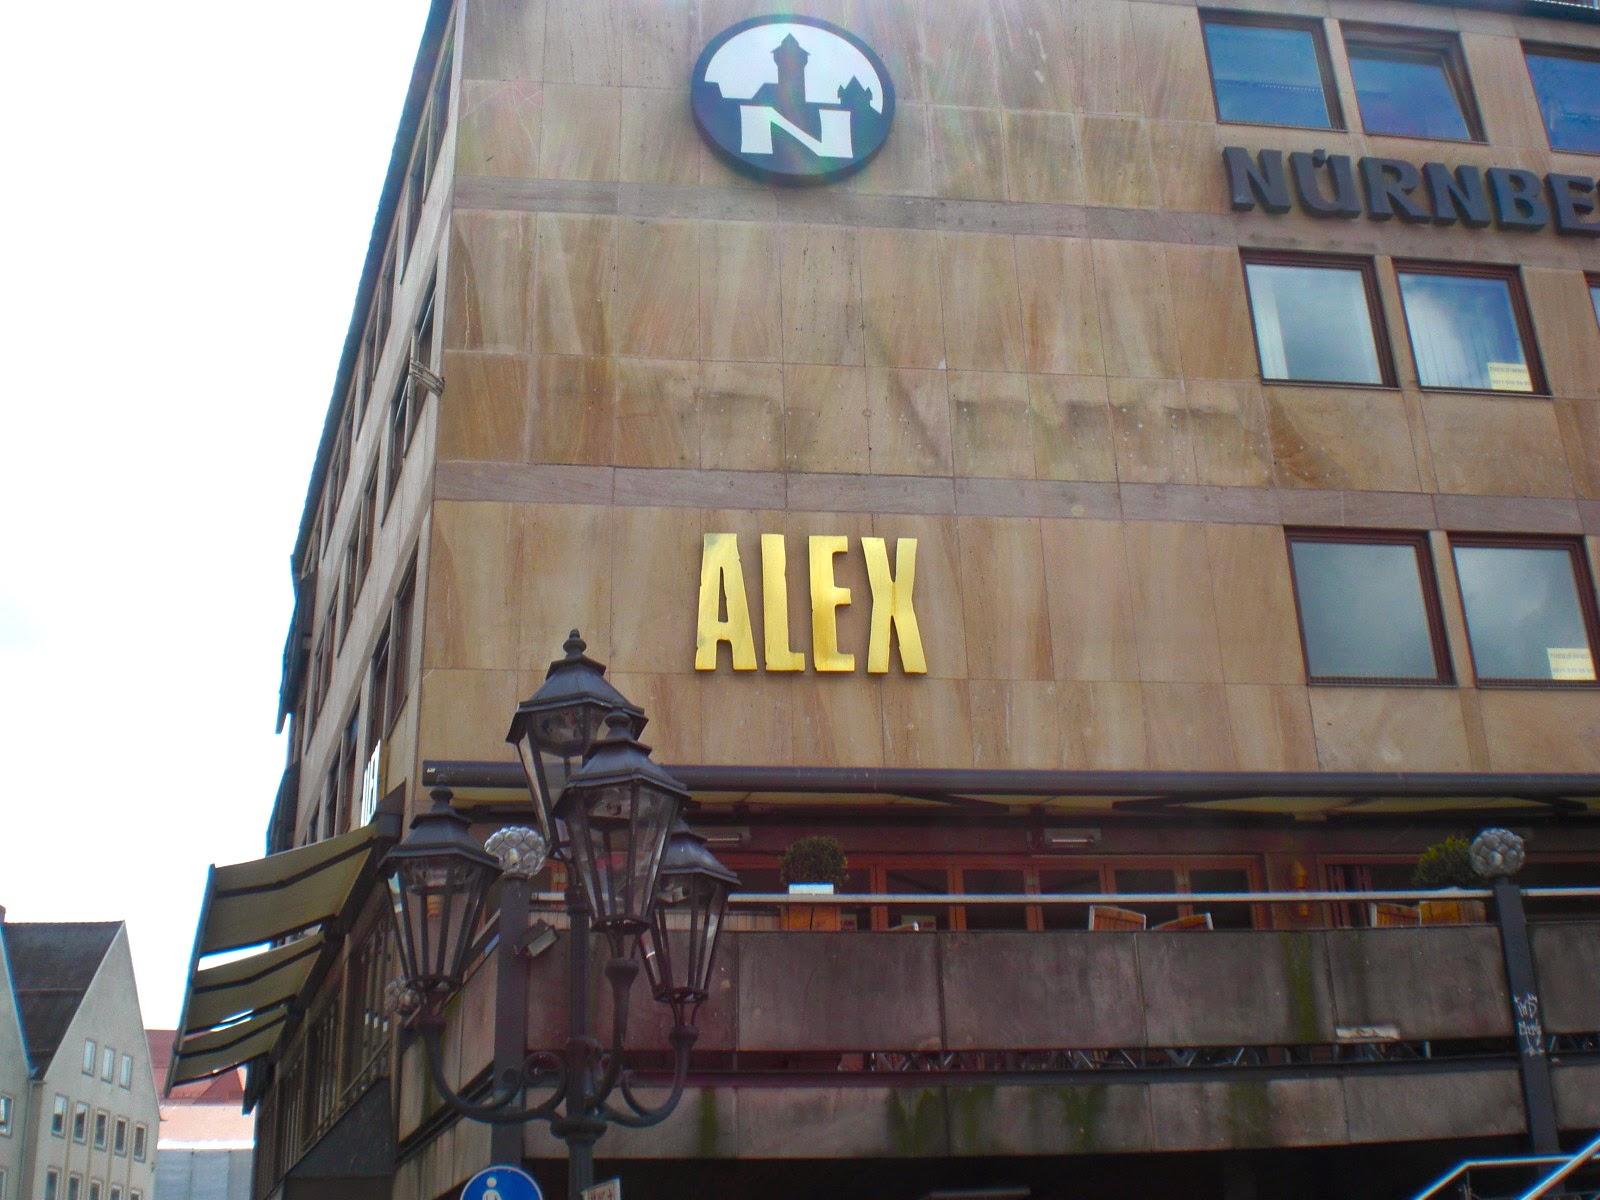 cafe alex nürnberg